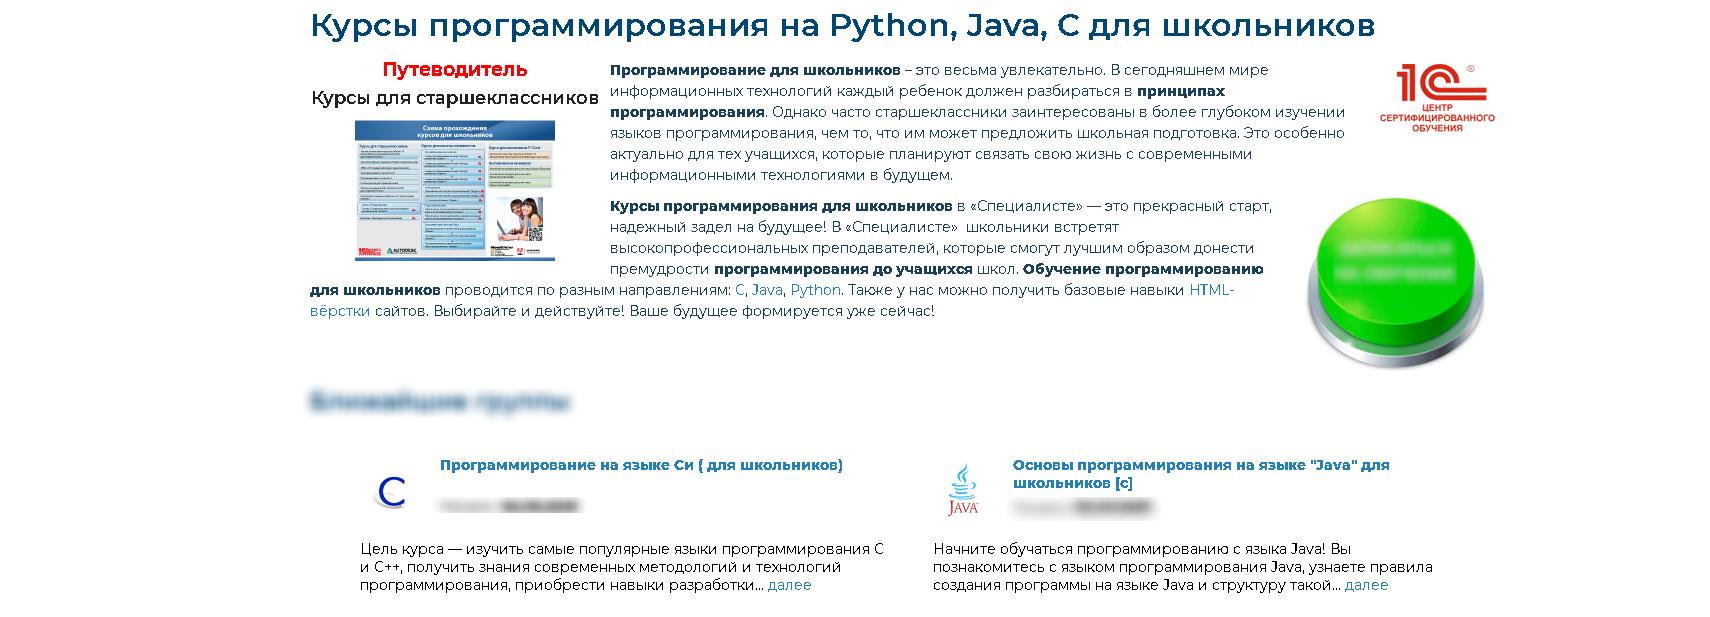 Специалист.ru